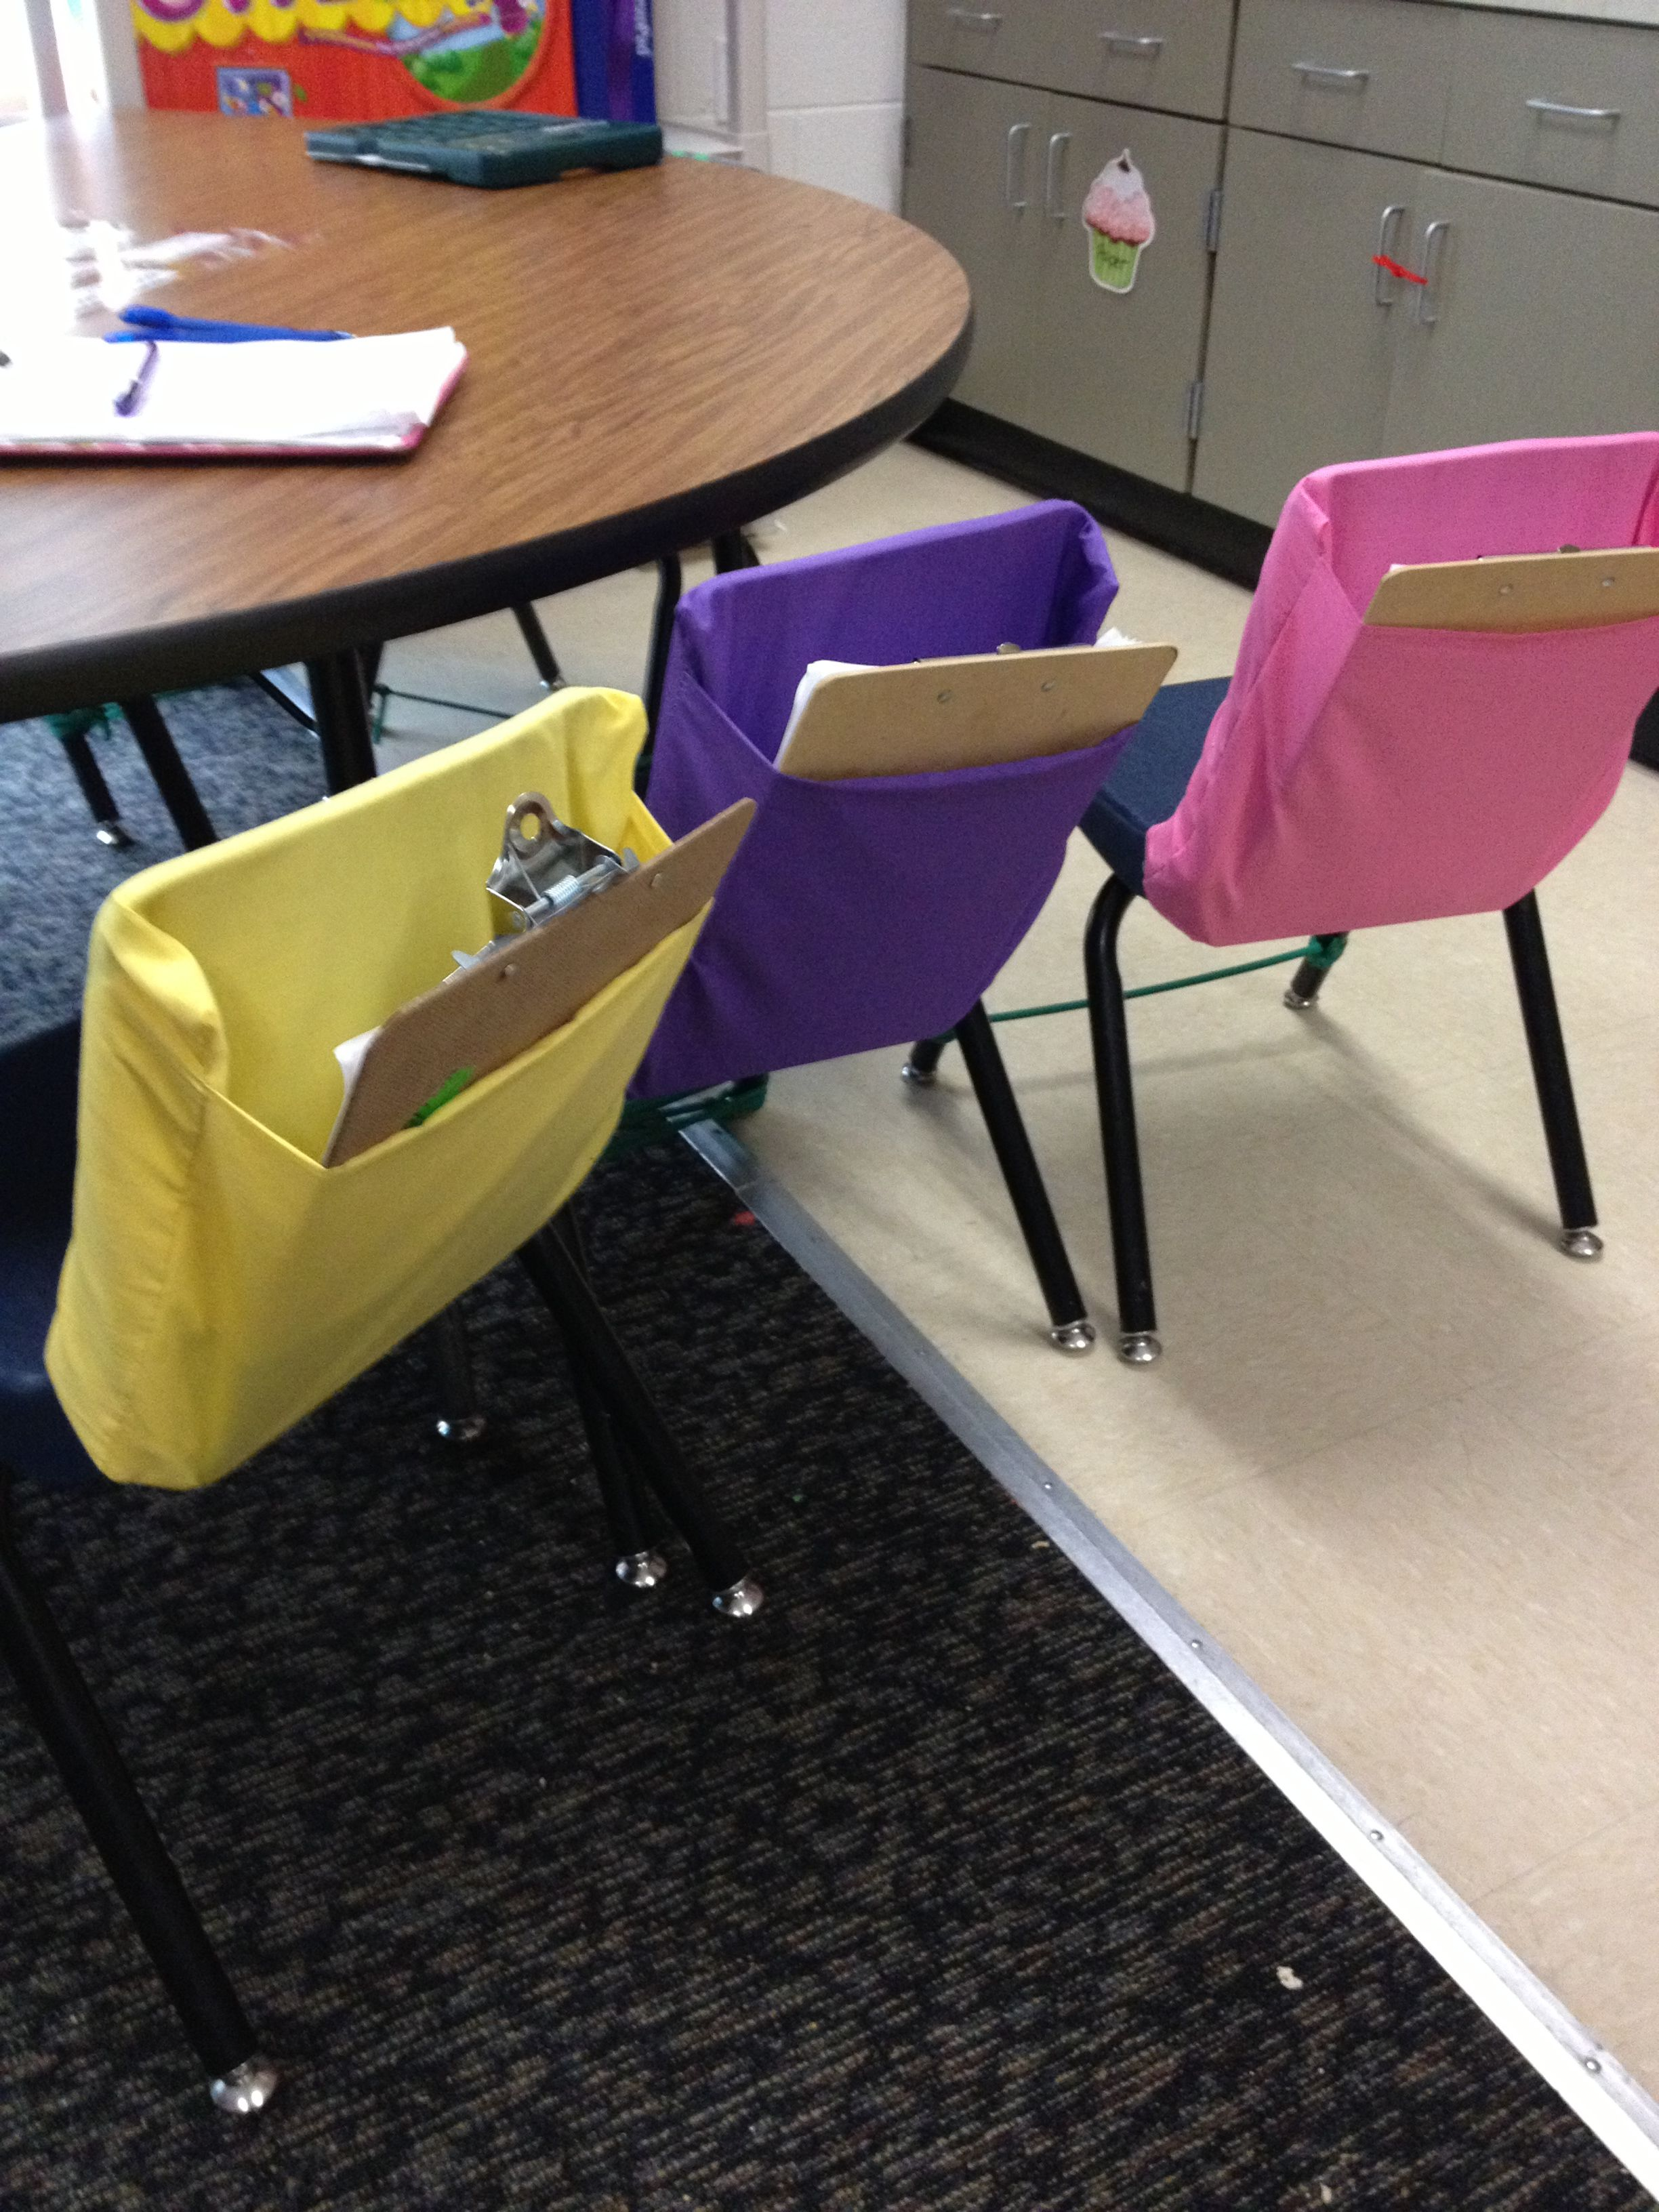 Classroom Organizer Chair Covers Kid Rocking Easy Diy Pockets Ms Layne 39s Room Pinterest